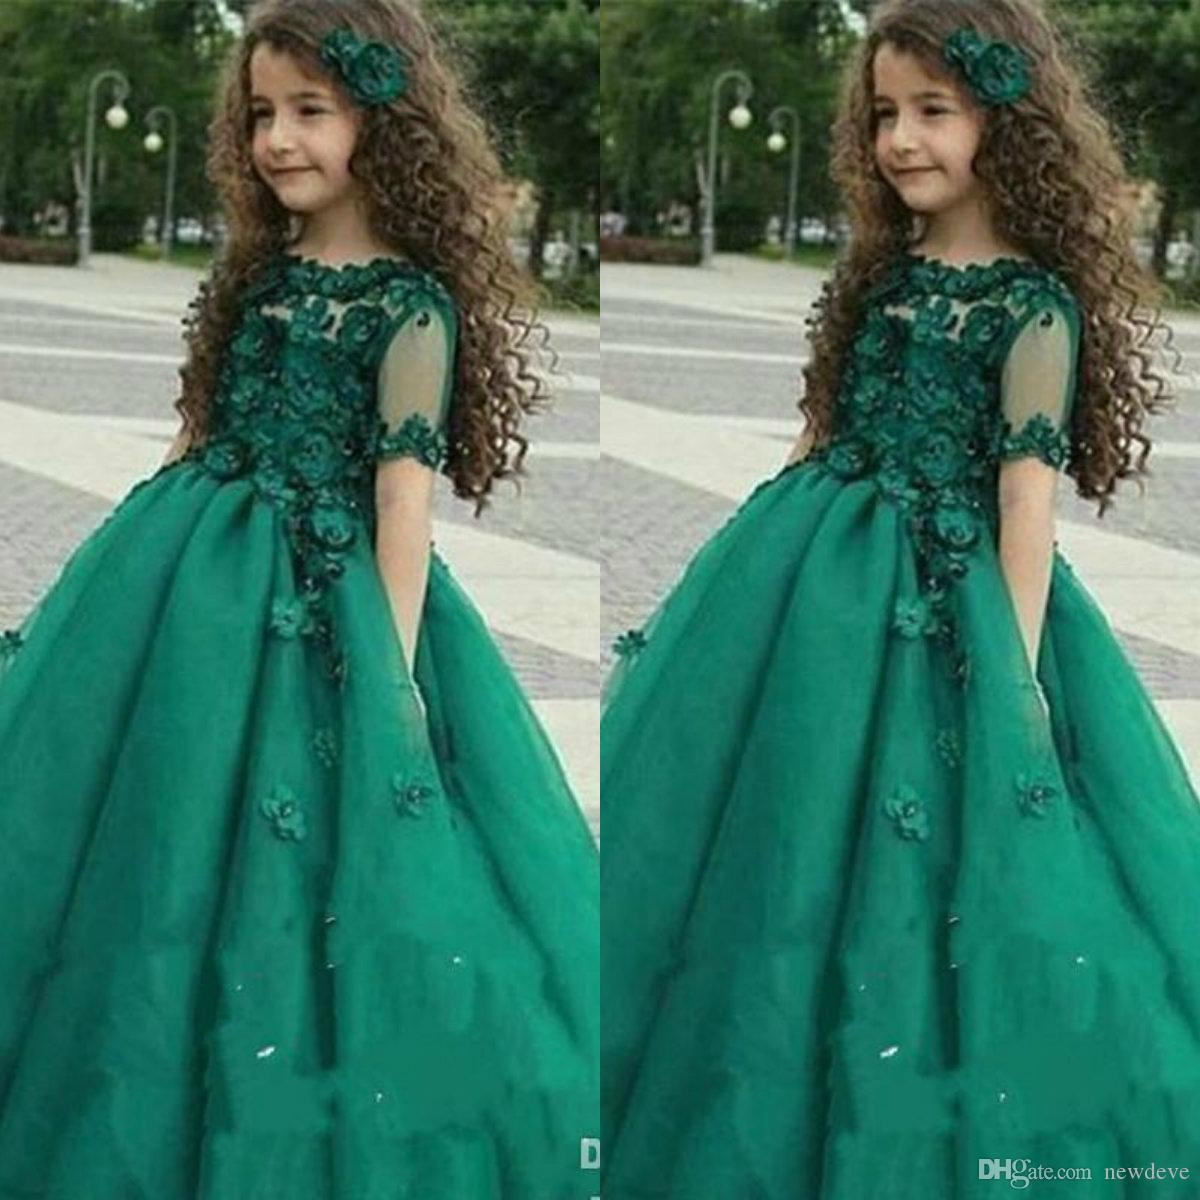 2019 Girls Pageant Dresses Princess Hunter Green Lace 3D Floral Appliques Maniche corte Girls Girls Dress Tulle Bambini Abiti da sposa